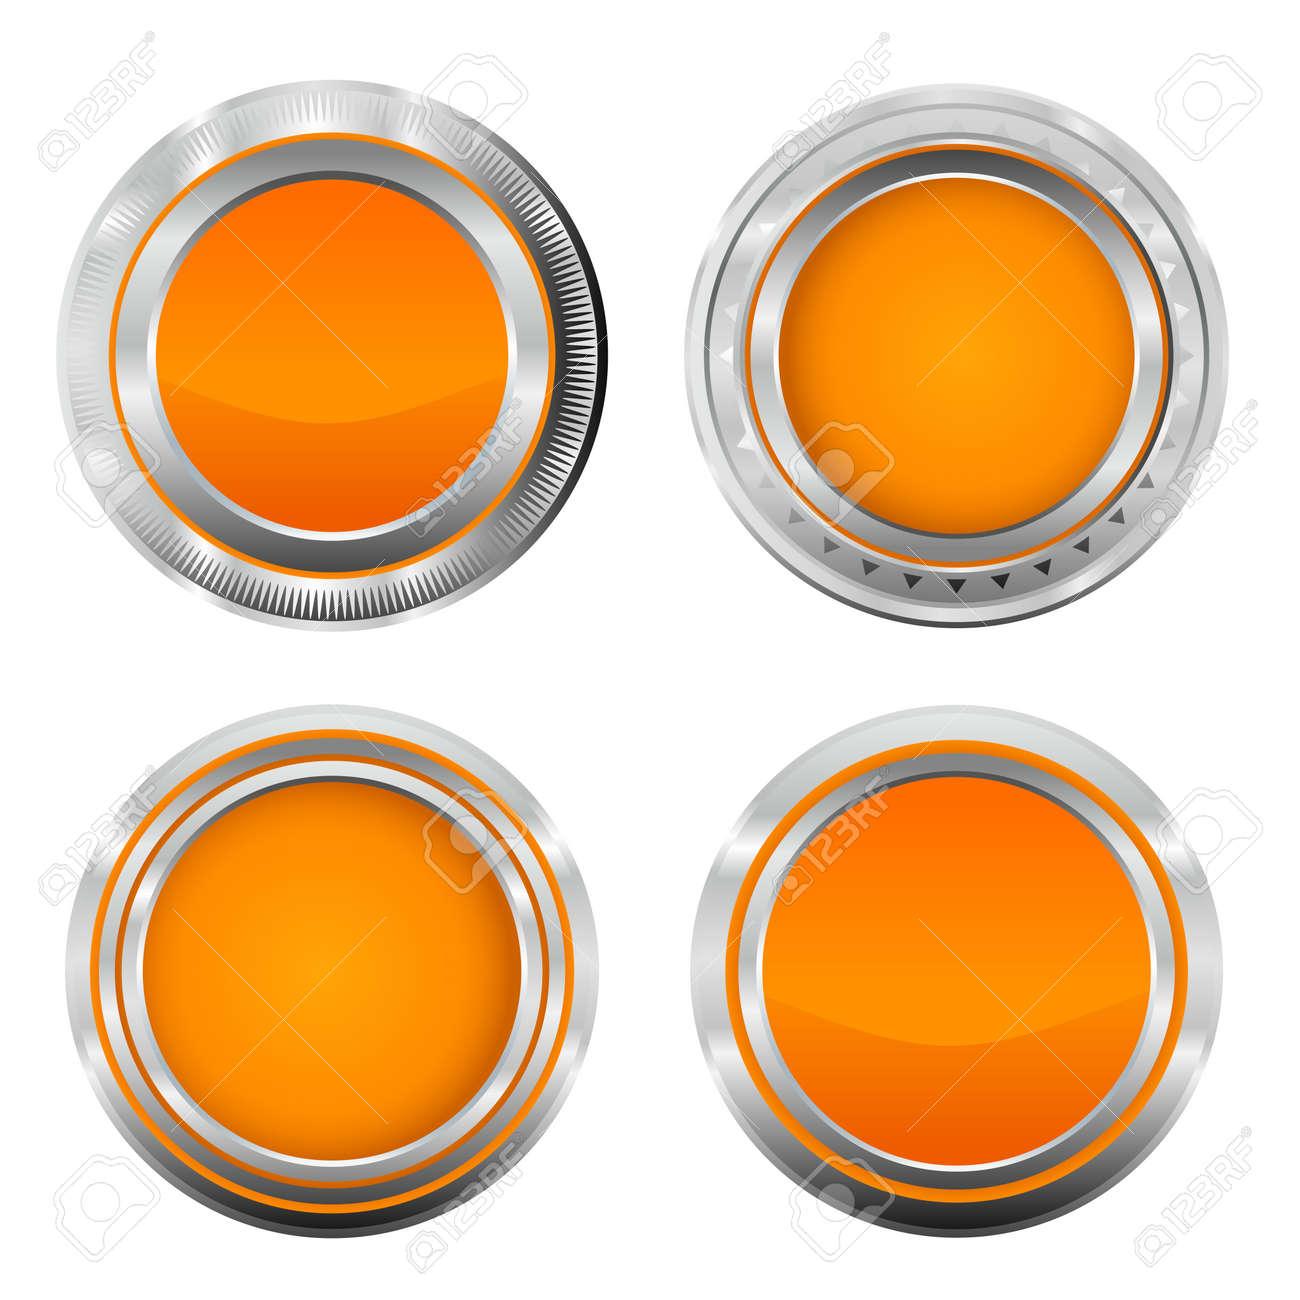 Realistic metallic orange badge buttons. Vector metallic button illustration from button series. - 156987566